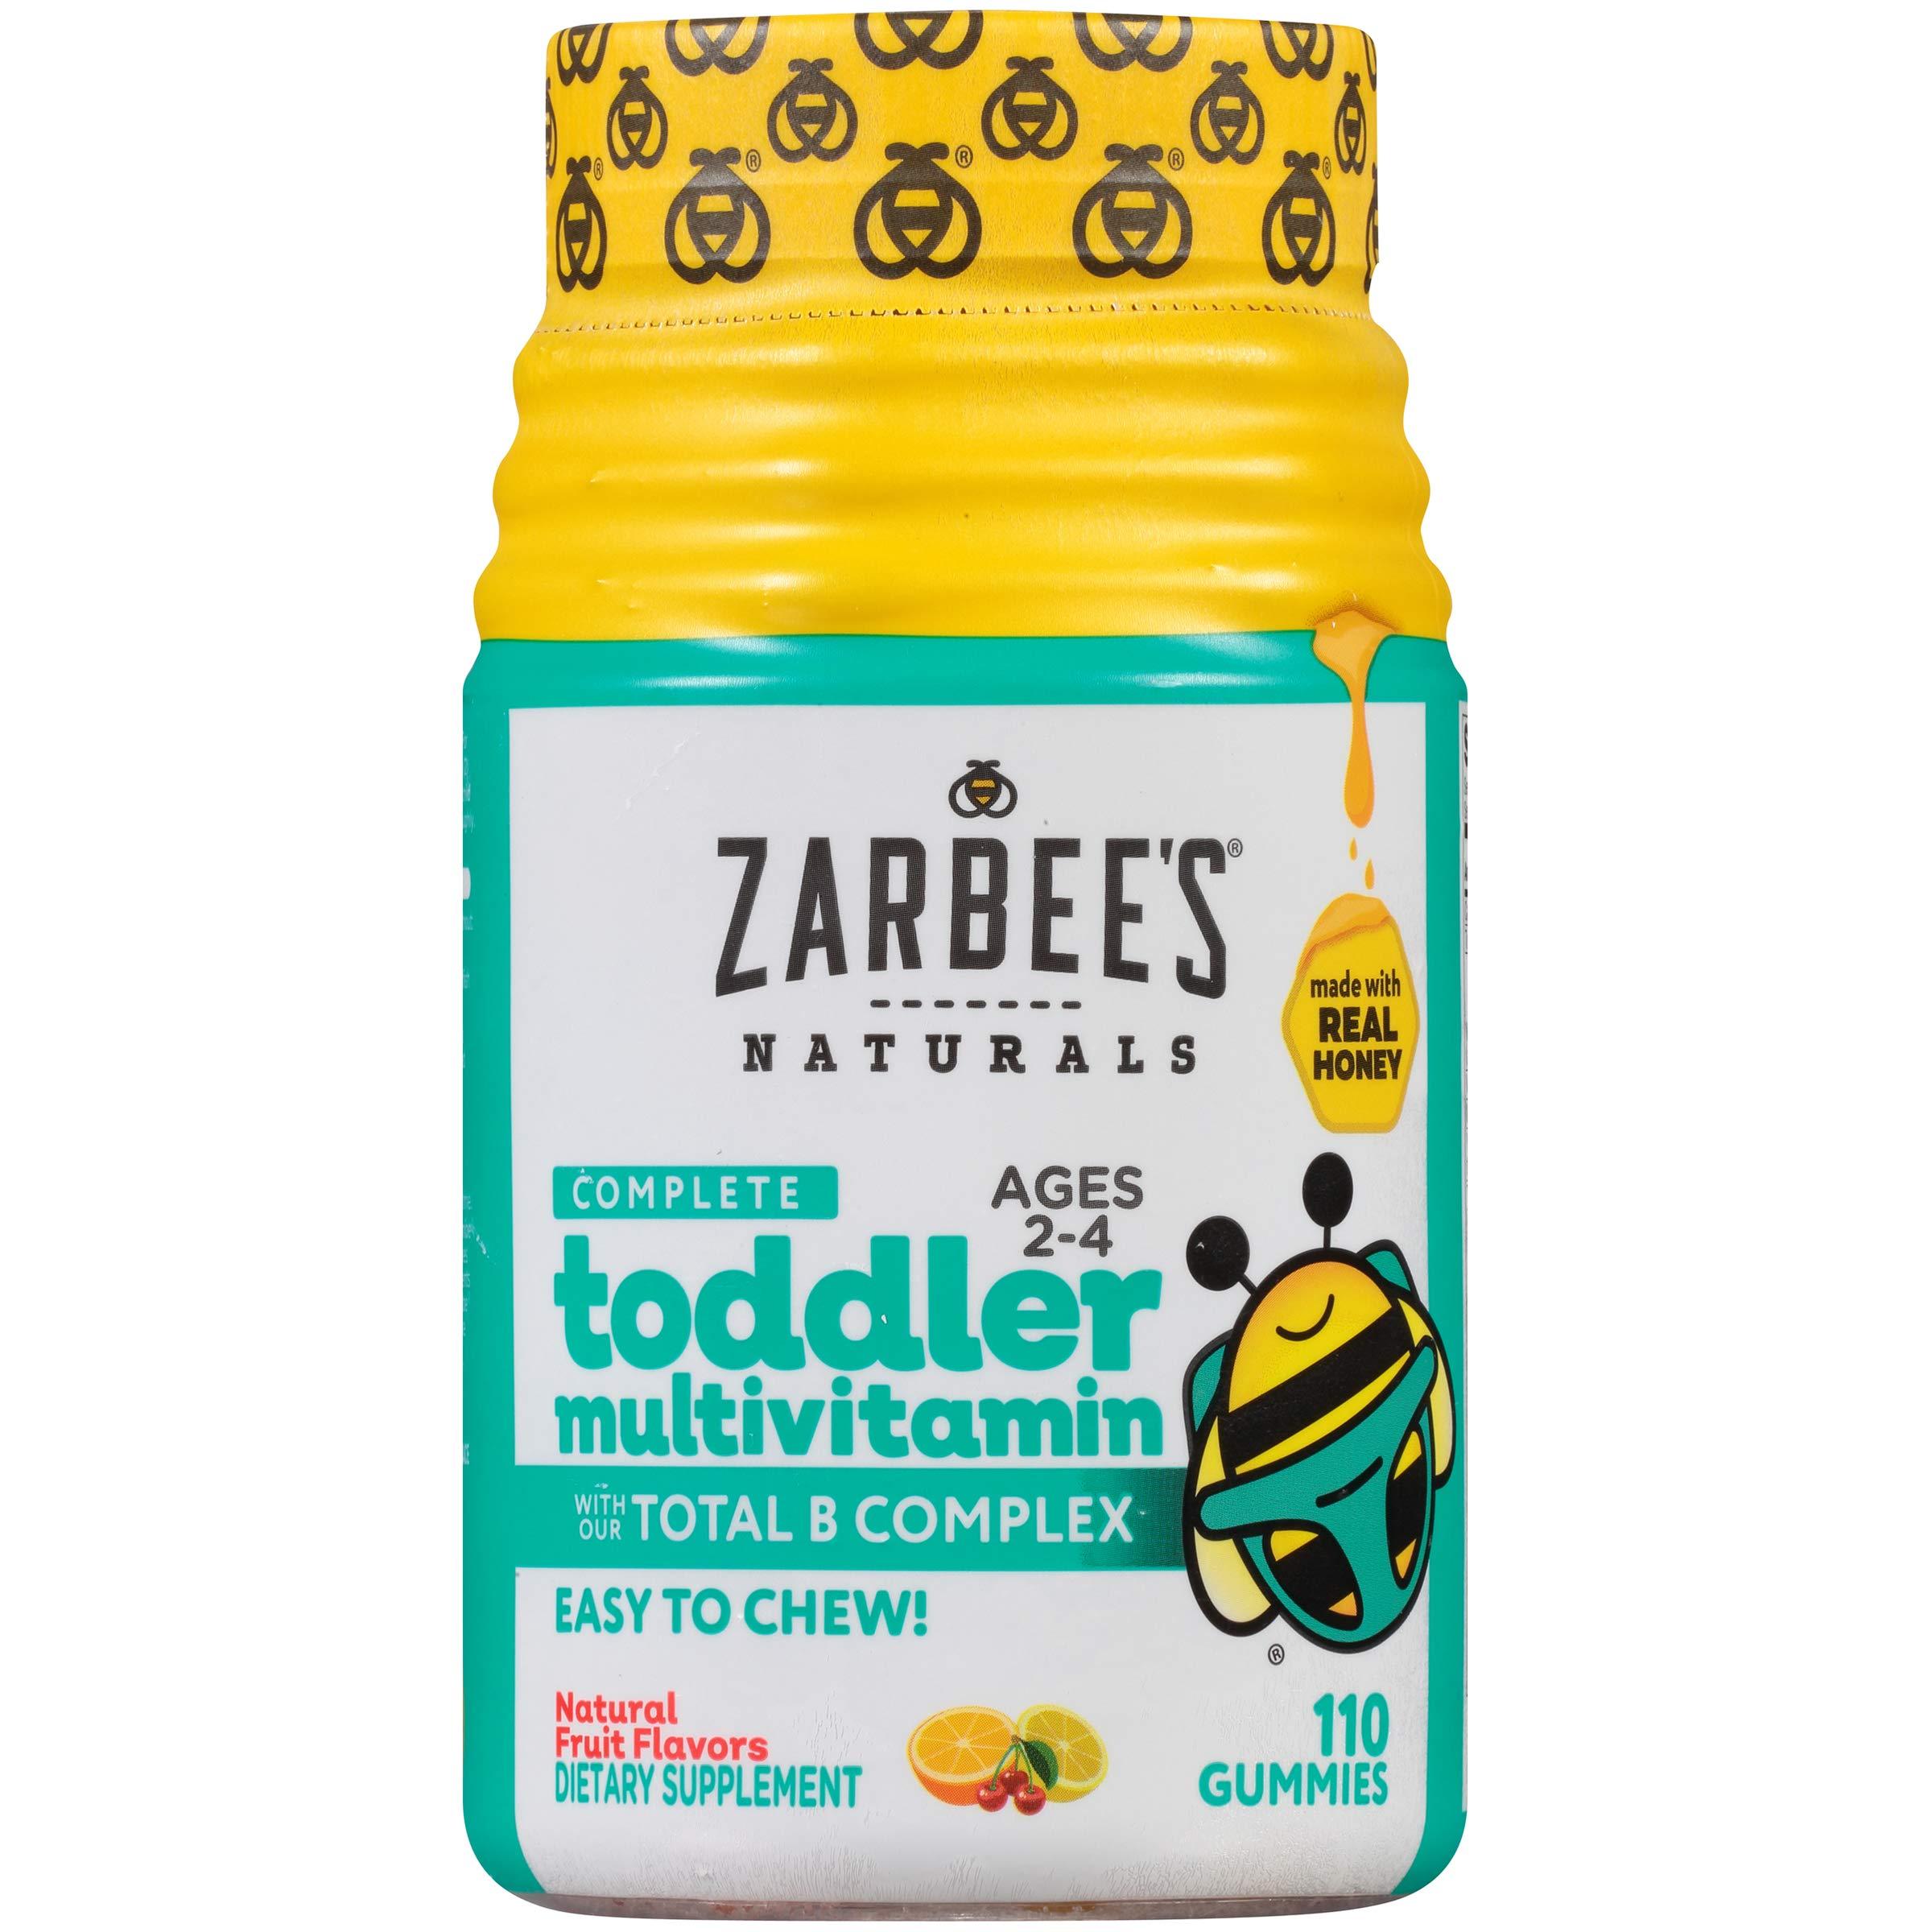 Zarbees Naturals Complete Multivitamin Essential